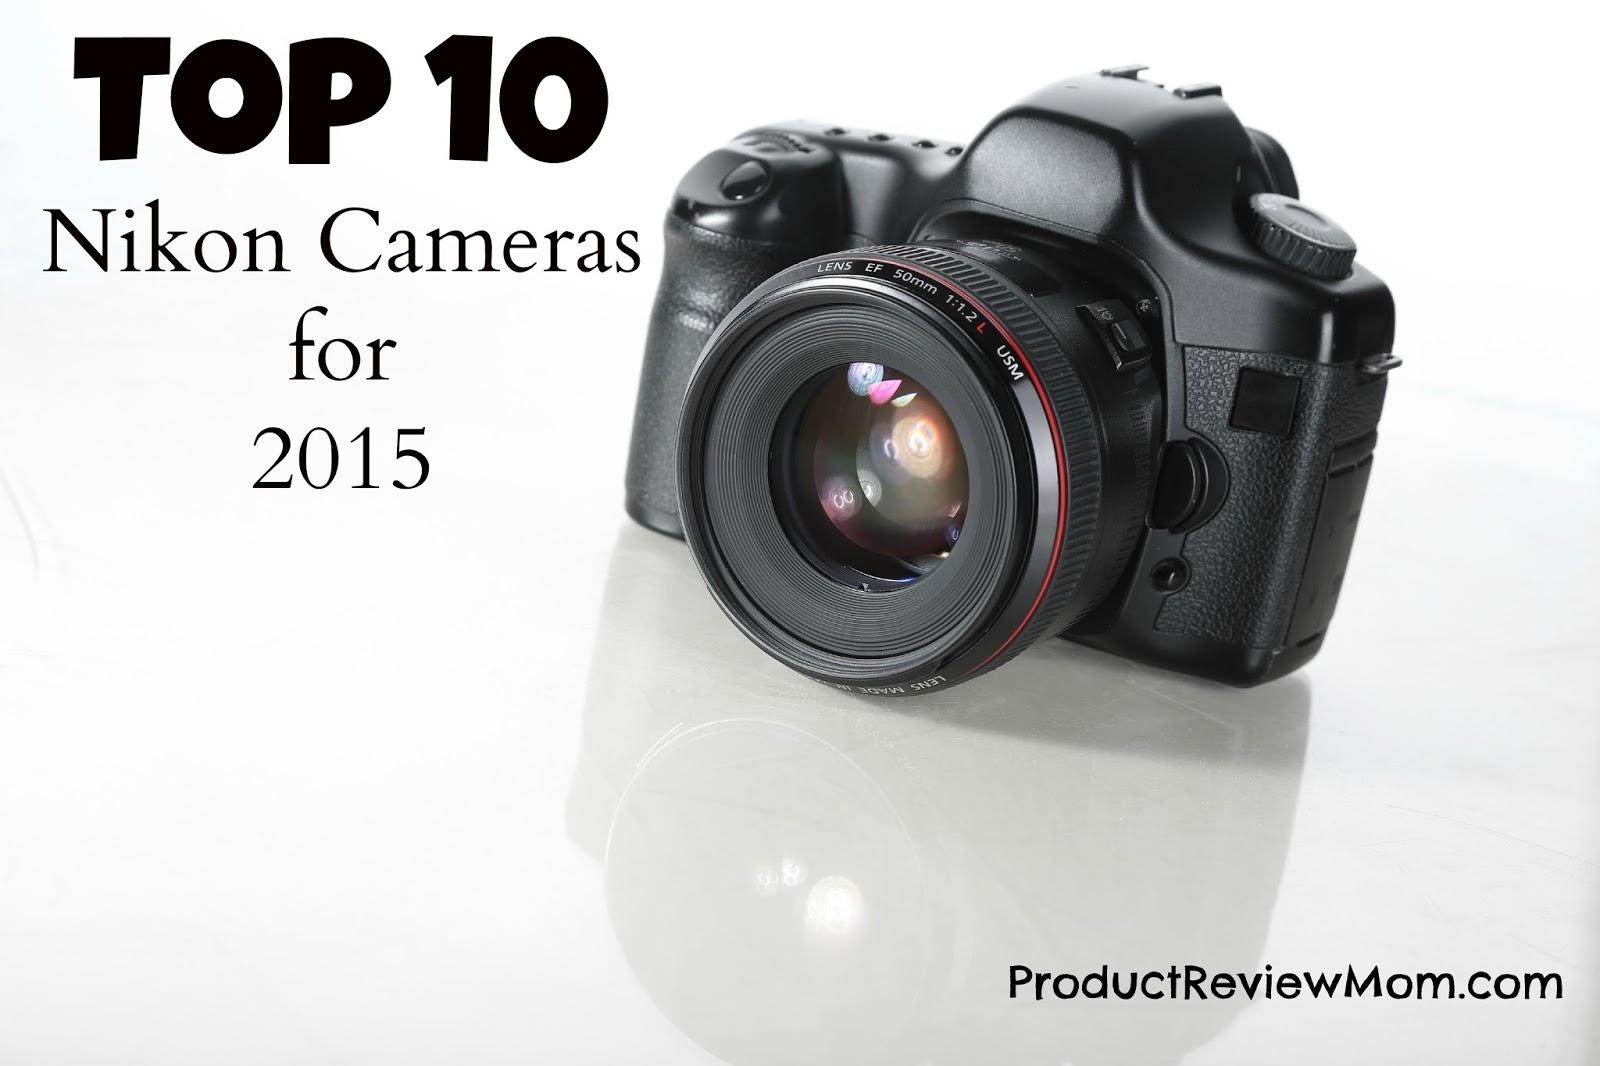 Top 10 Nikon Cameras for 2015